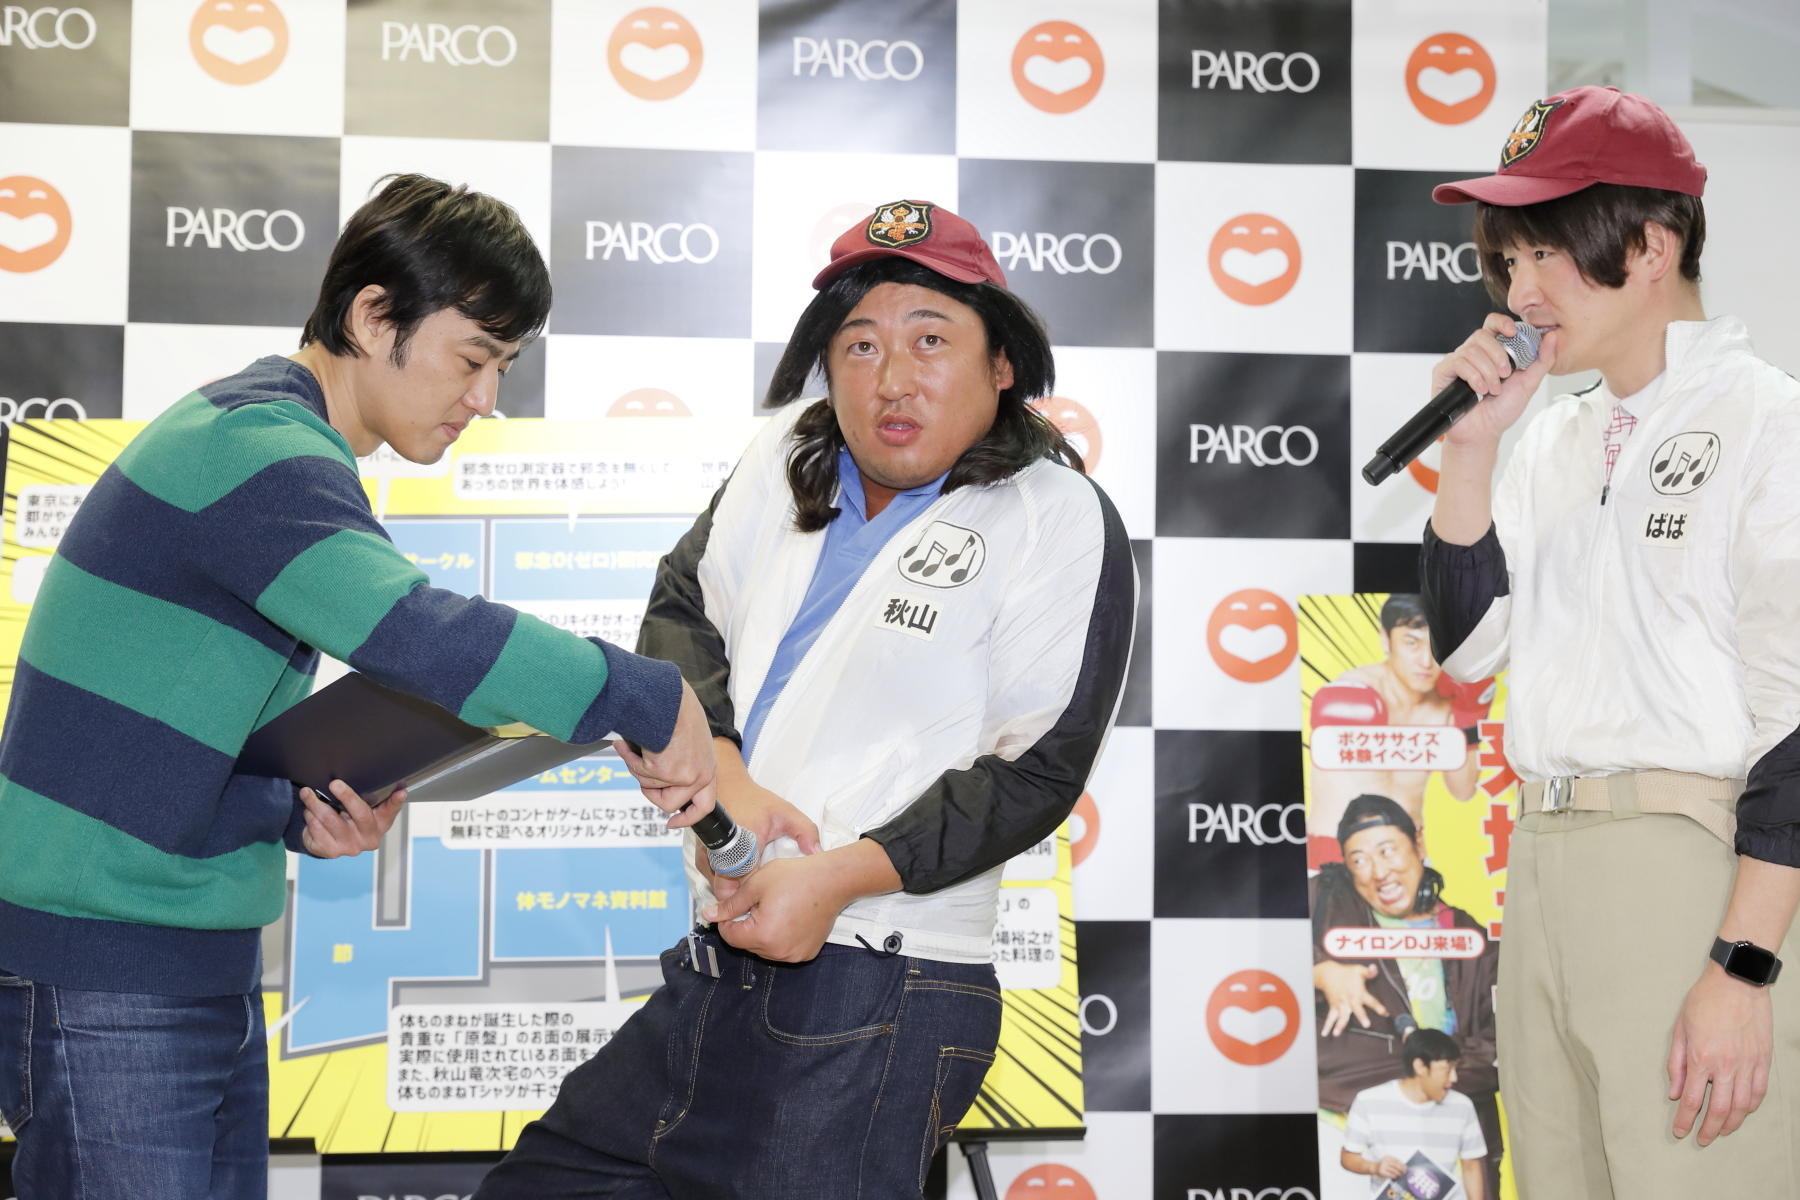 http://news.yoshimoto.co.jp/20181207184651-f6de074b57acd4c5fabbee6306722cfeb4229a62.jpg